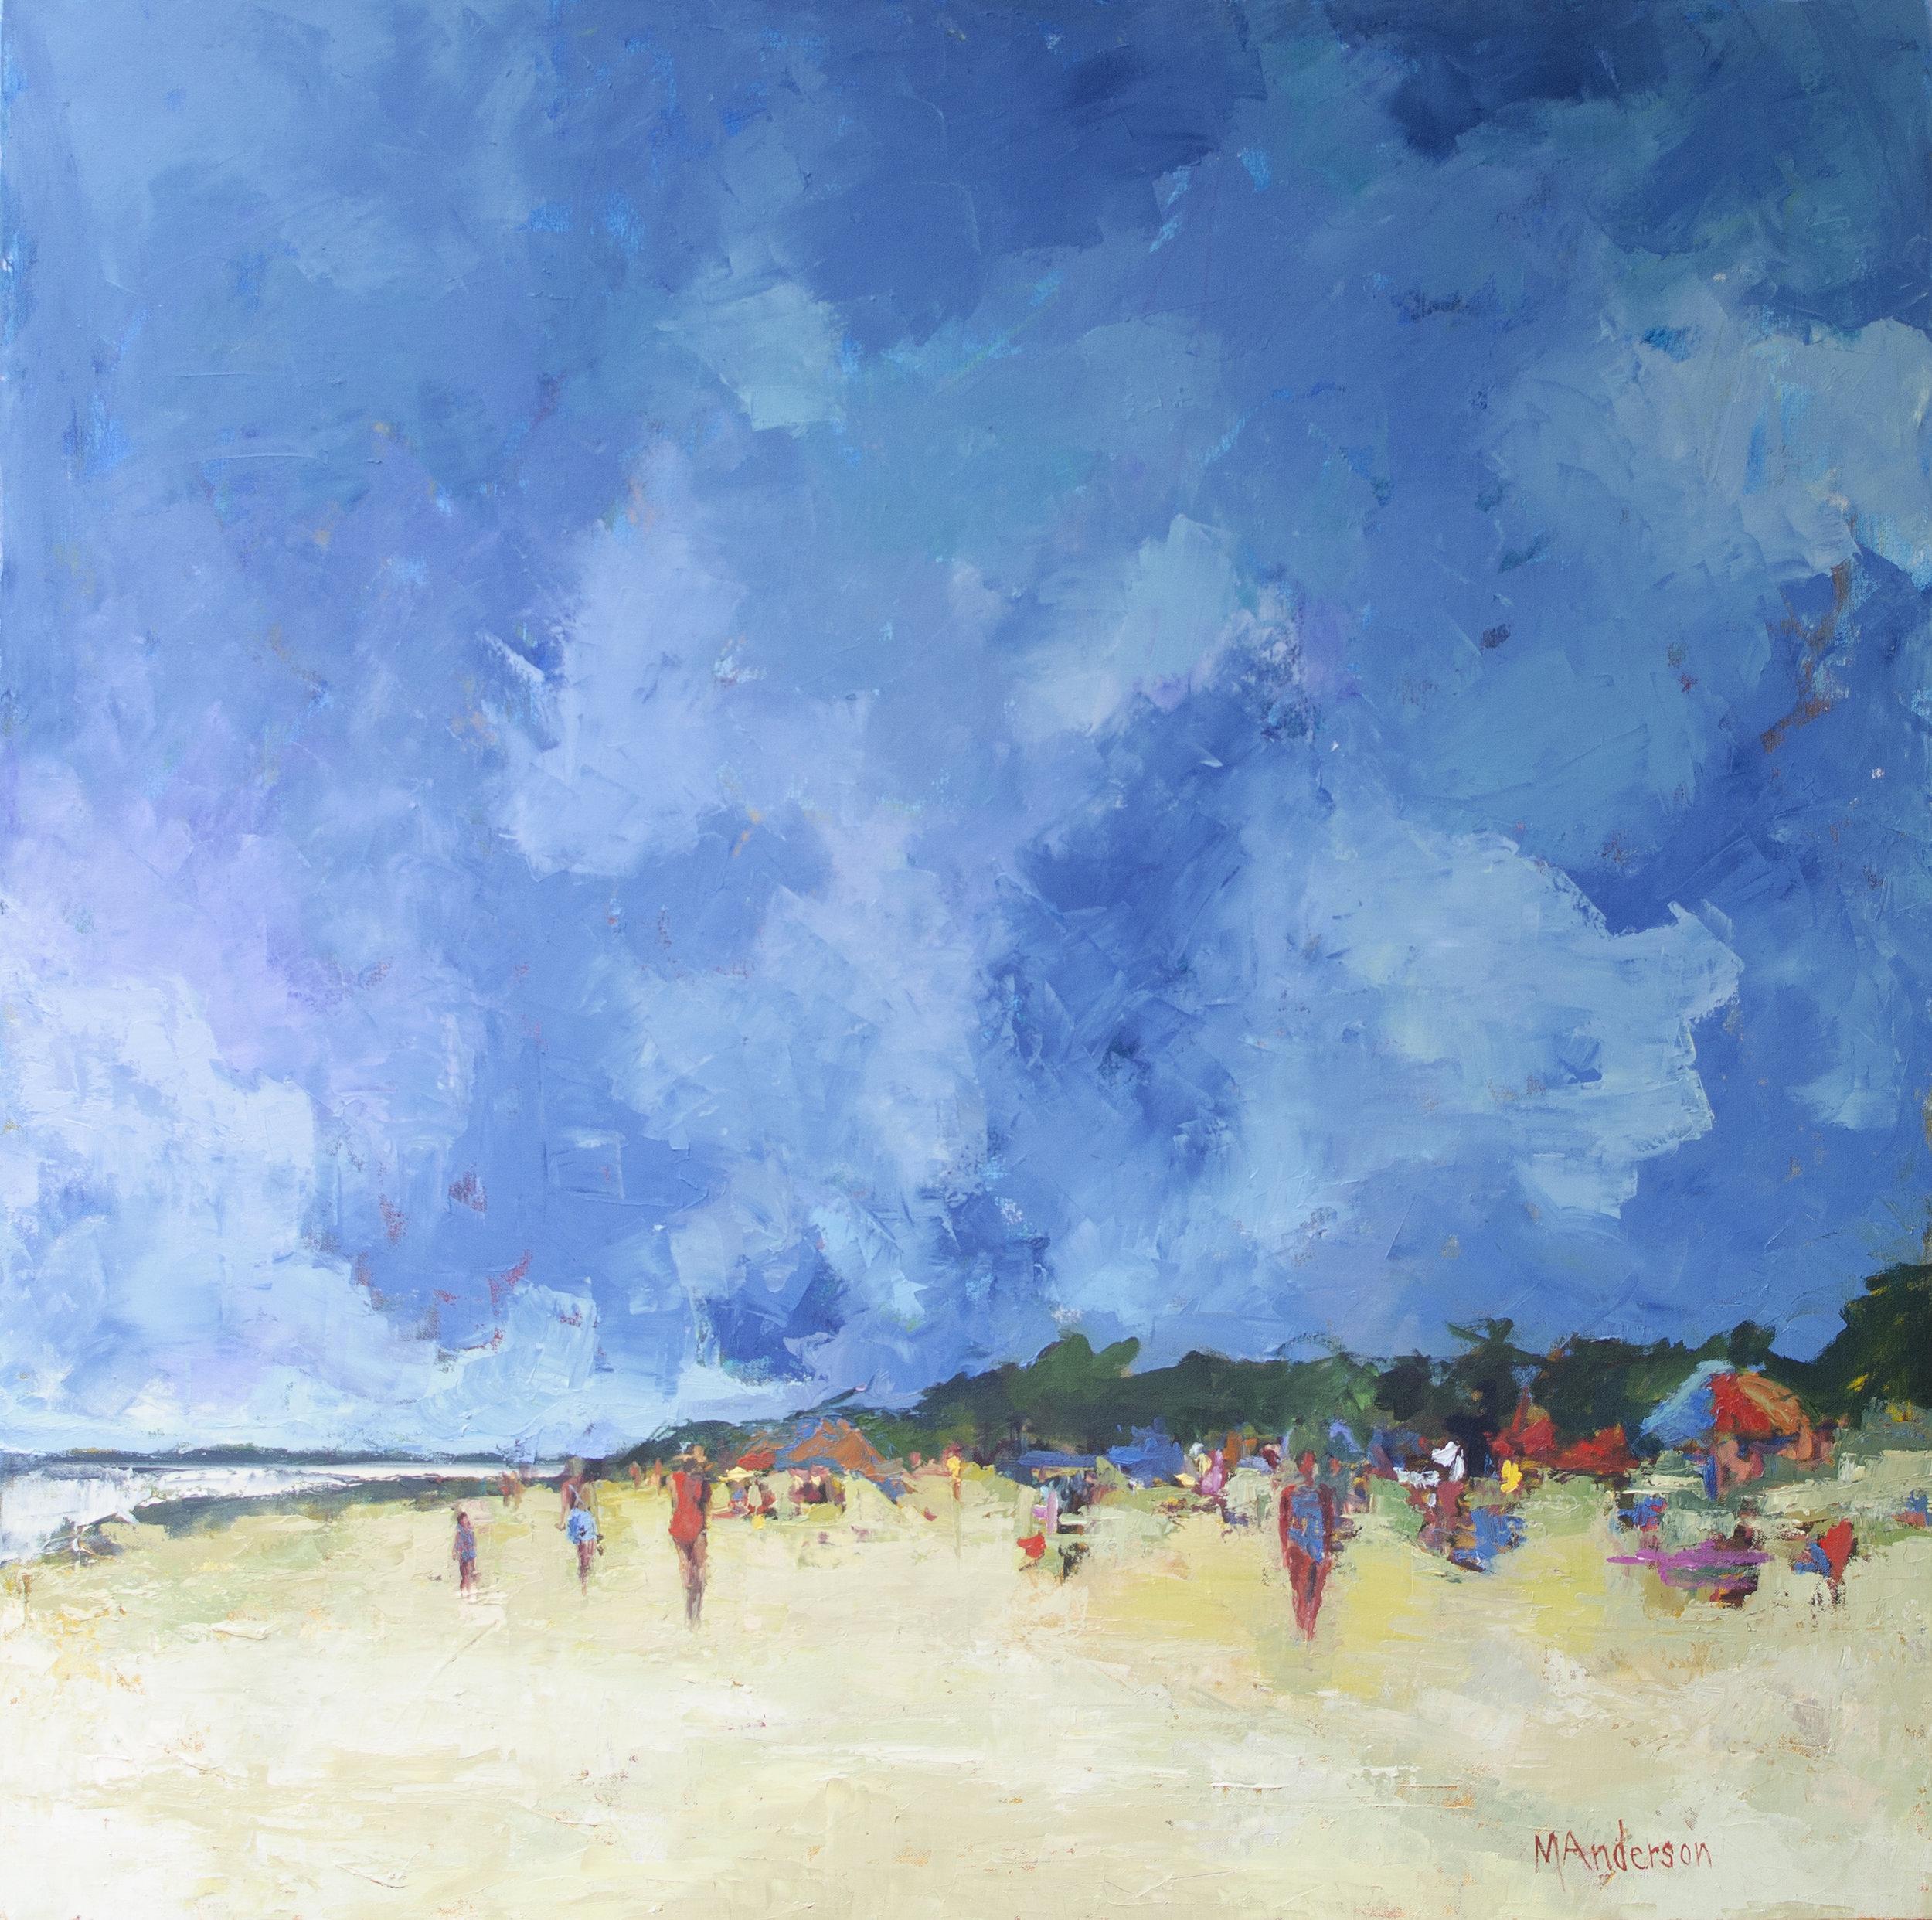 Shoreline (40x40 Canvas) - Available